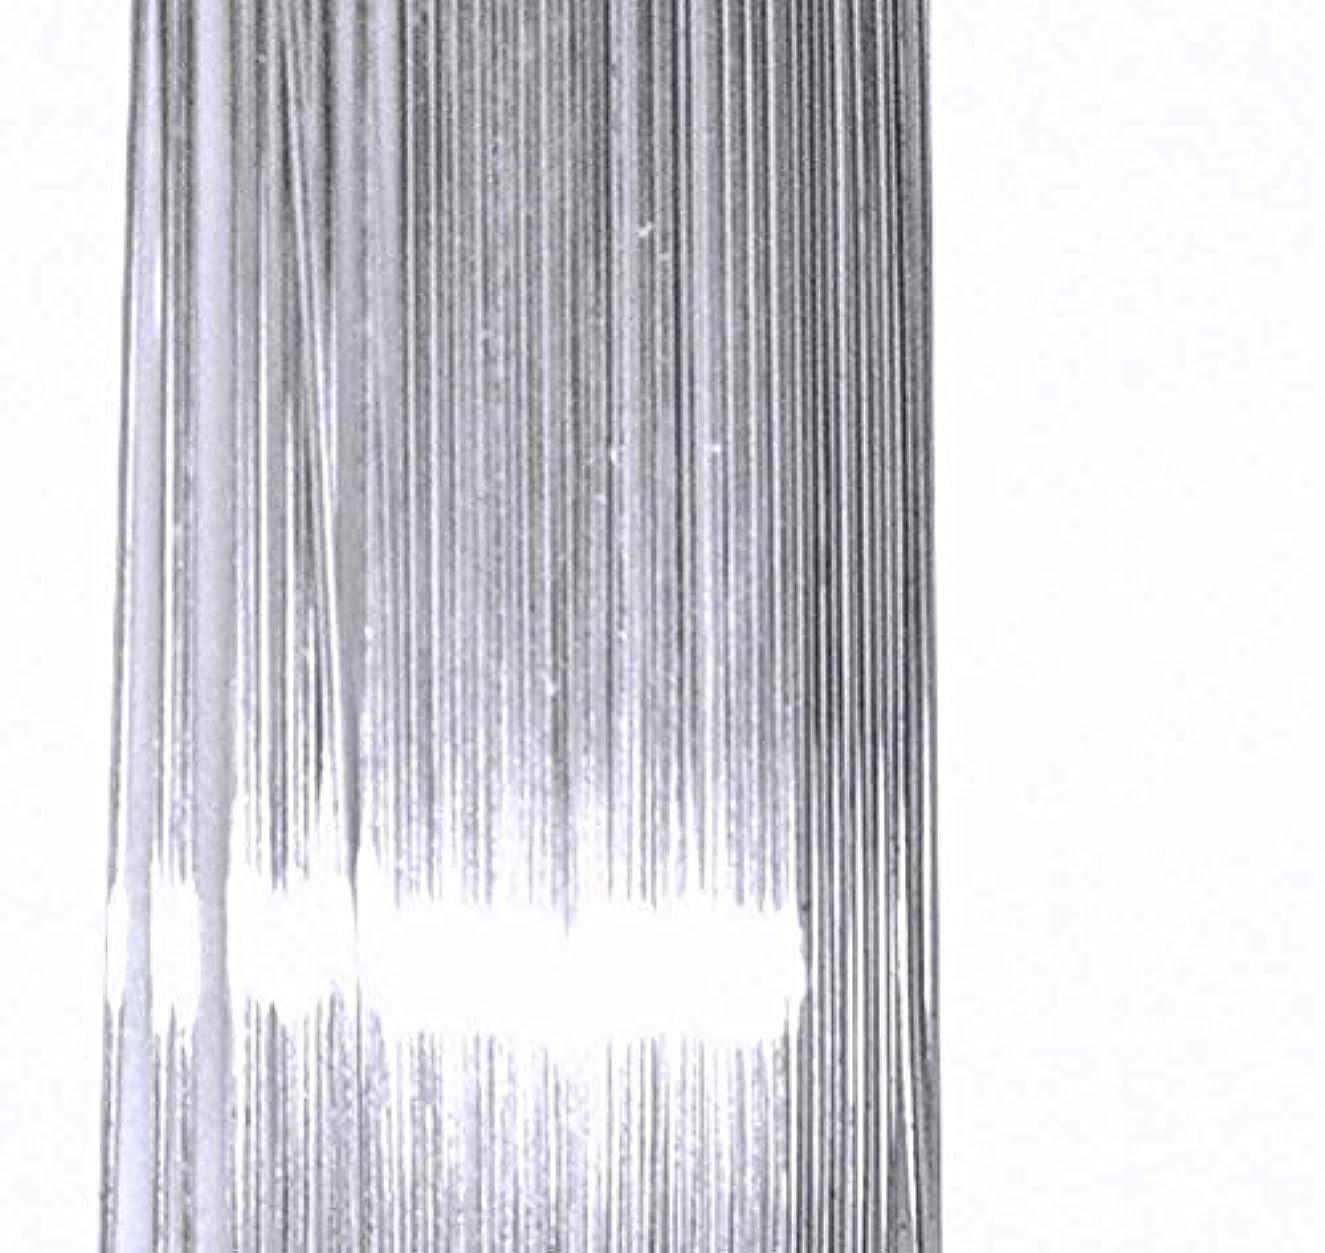 Silver Solder Wire 30 Gauge Ultra Thin 0.010 Inch (Qty=15 feet)